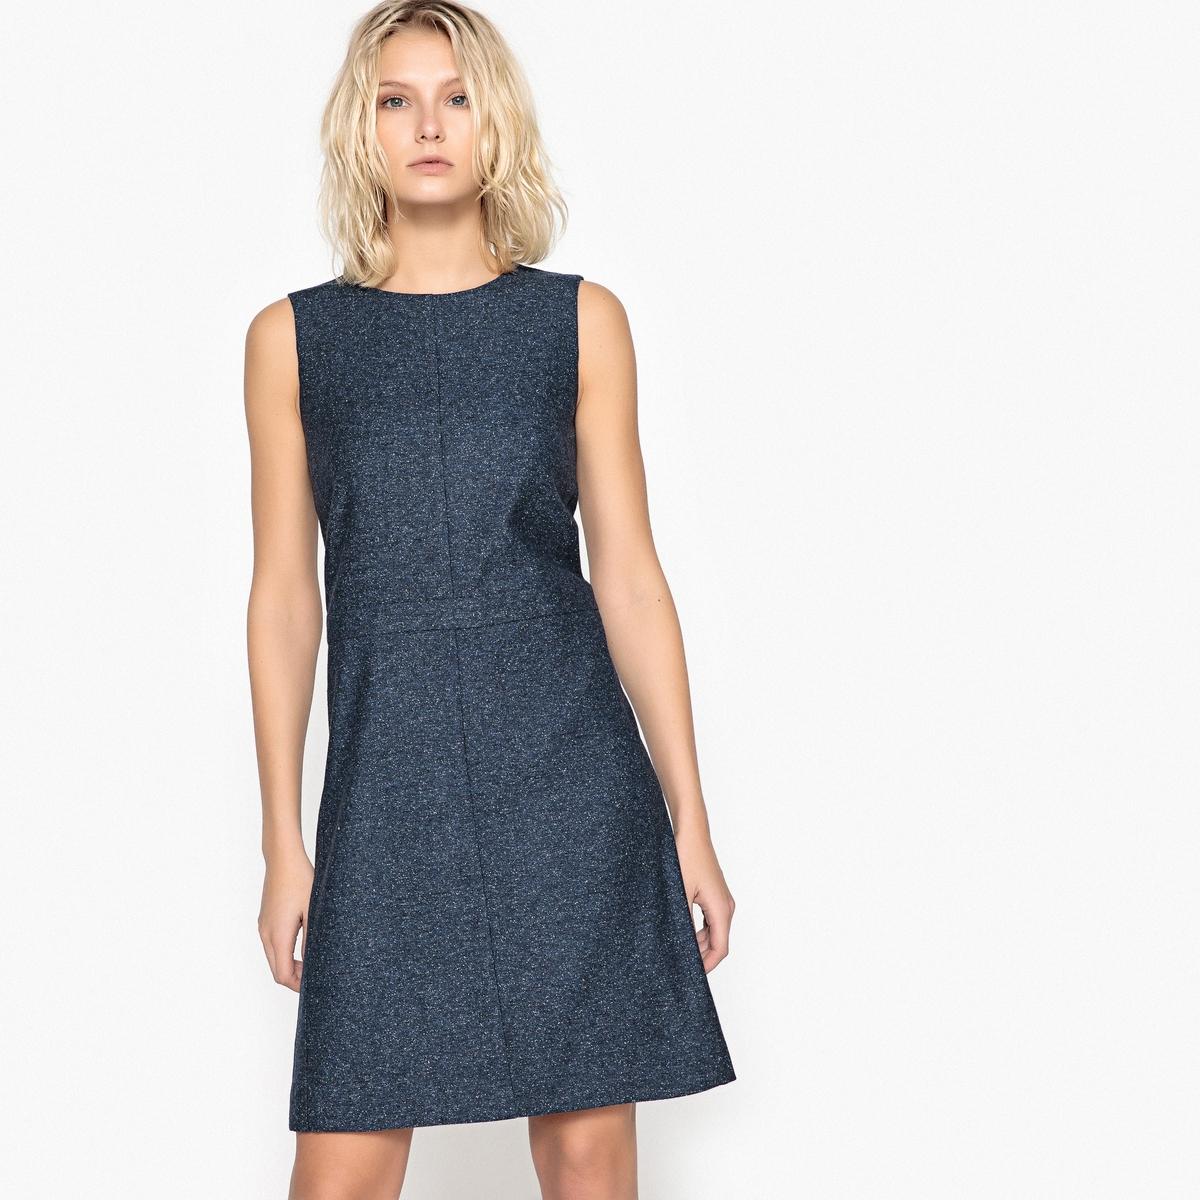 Vestido em lã matizada